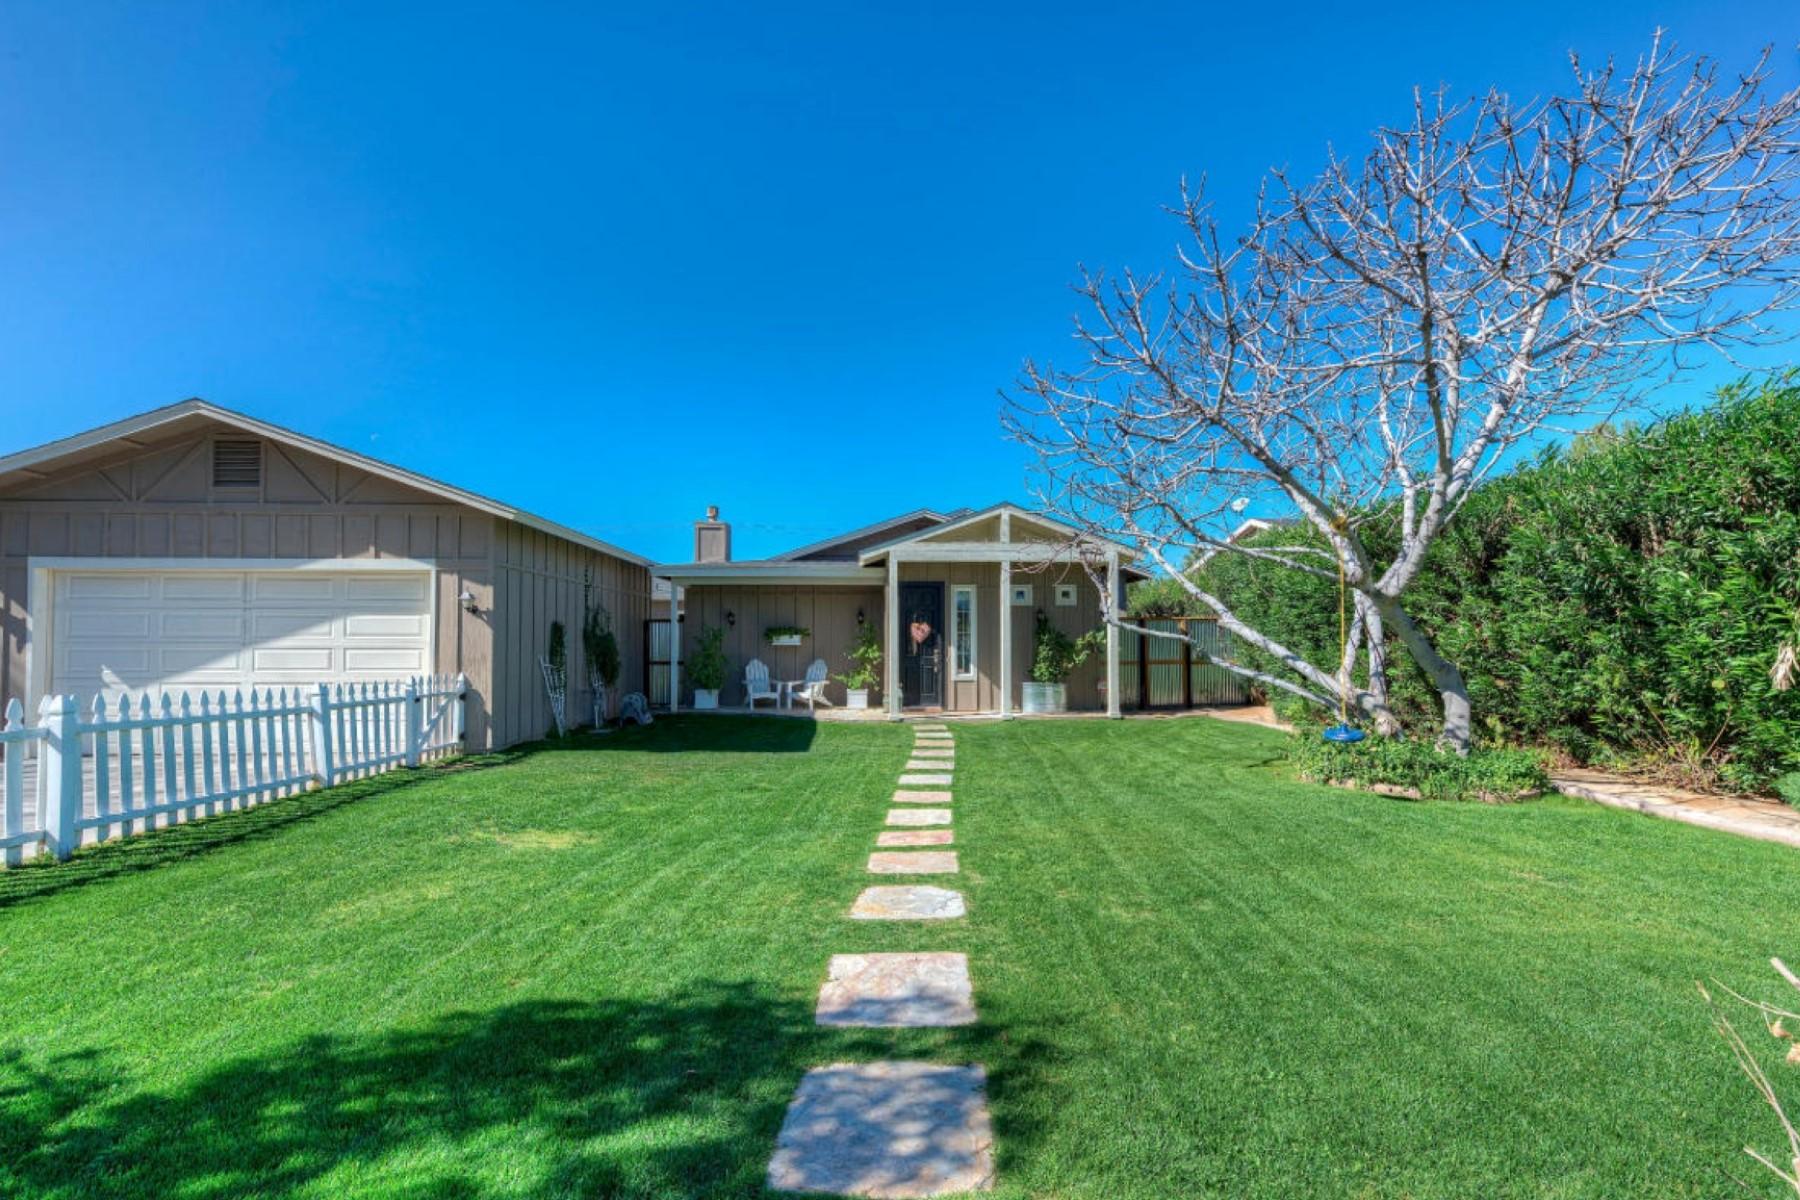 Moradia para Venda às Fantastic Remodeled Home In The Heart Of It All 3612 N 51st Place Phoenix, Arizona 85018 Estados Unidos